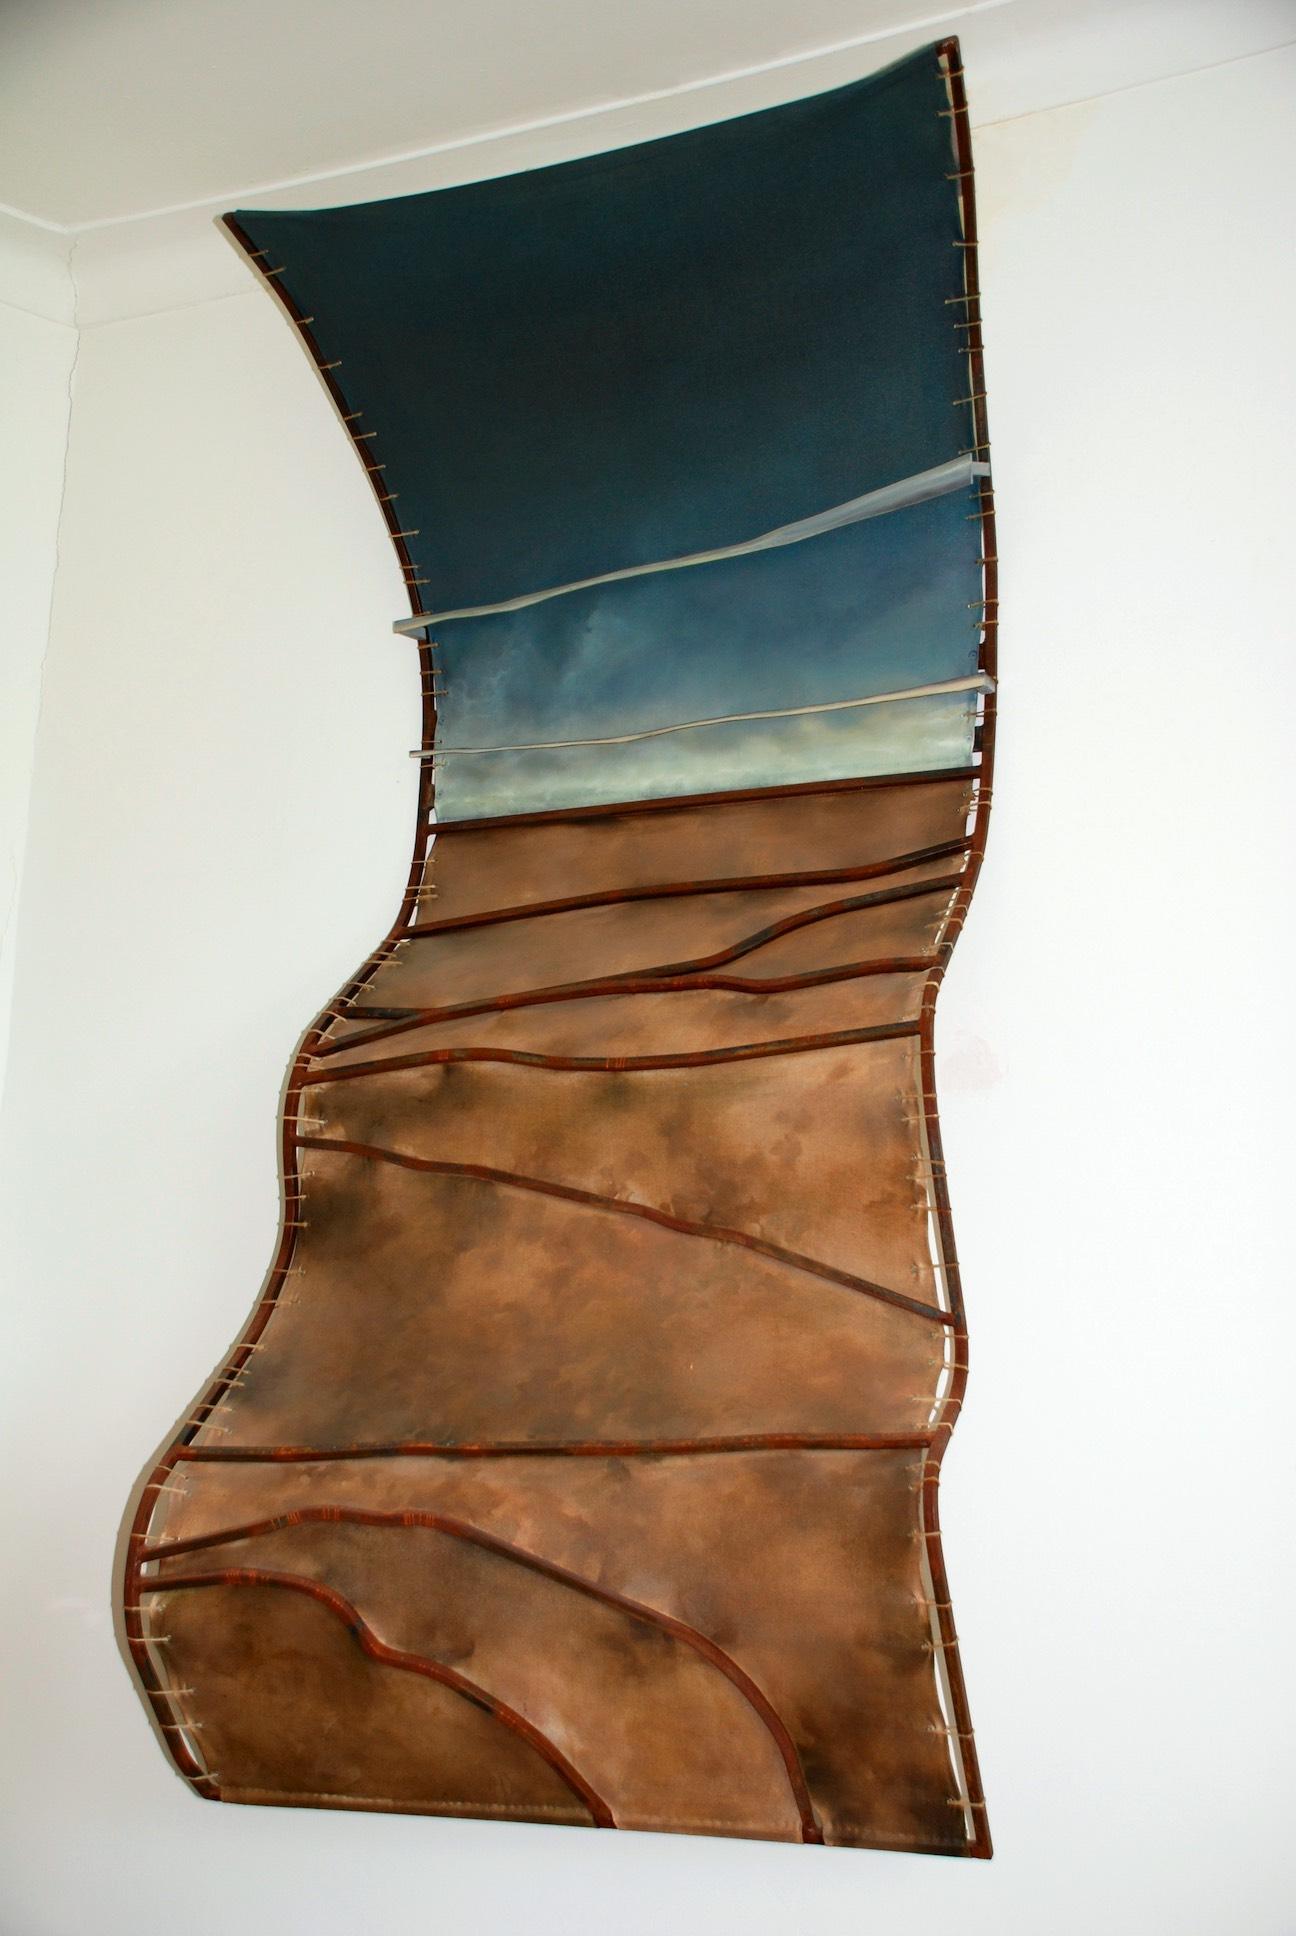 Rock desertscape with metal frame